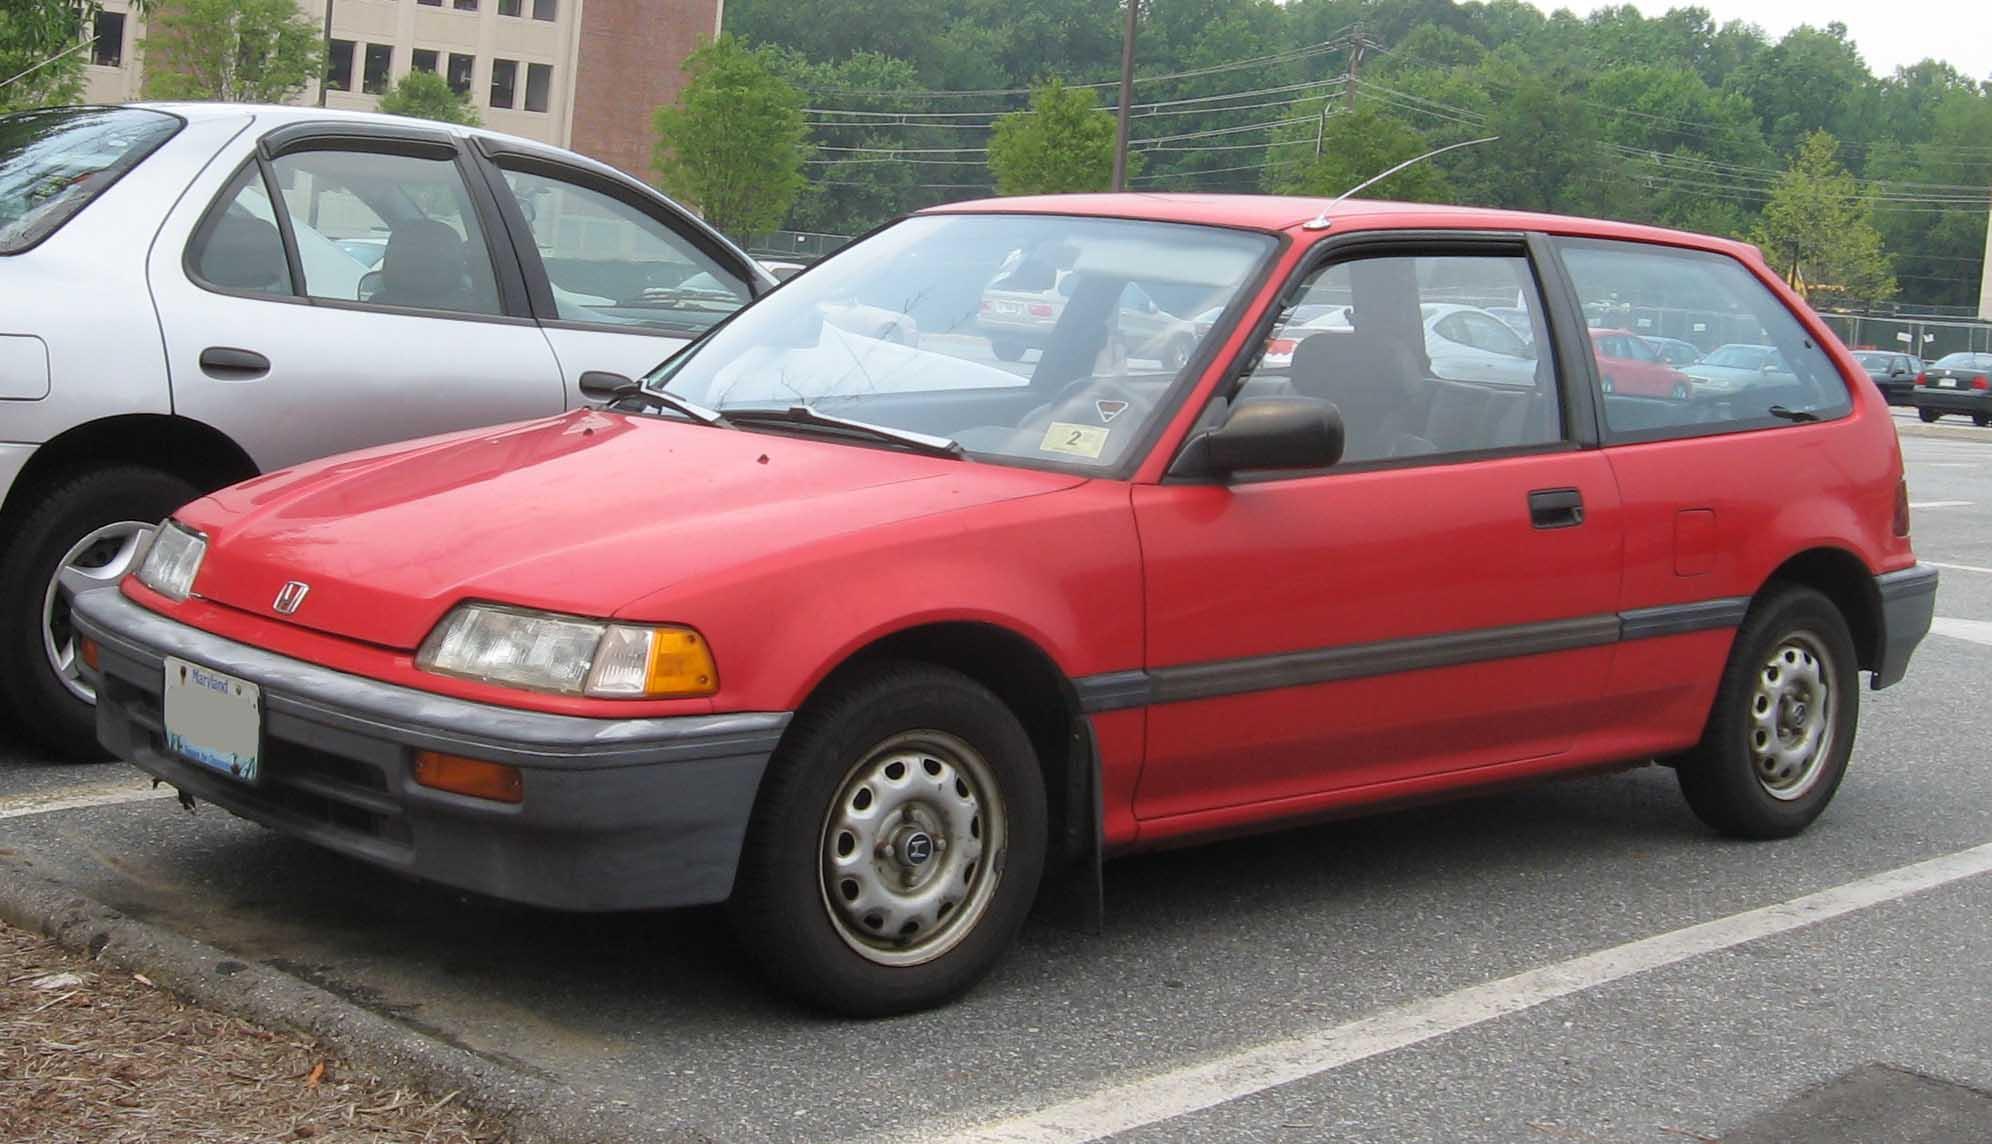 File:88 91 Honda Civic Hatch